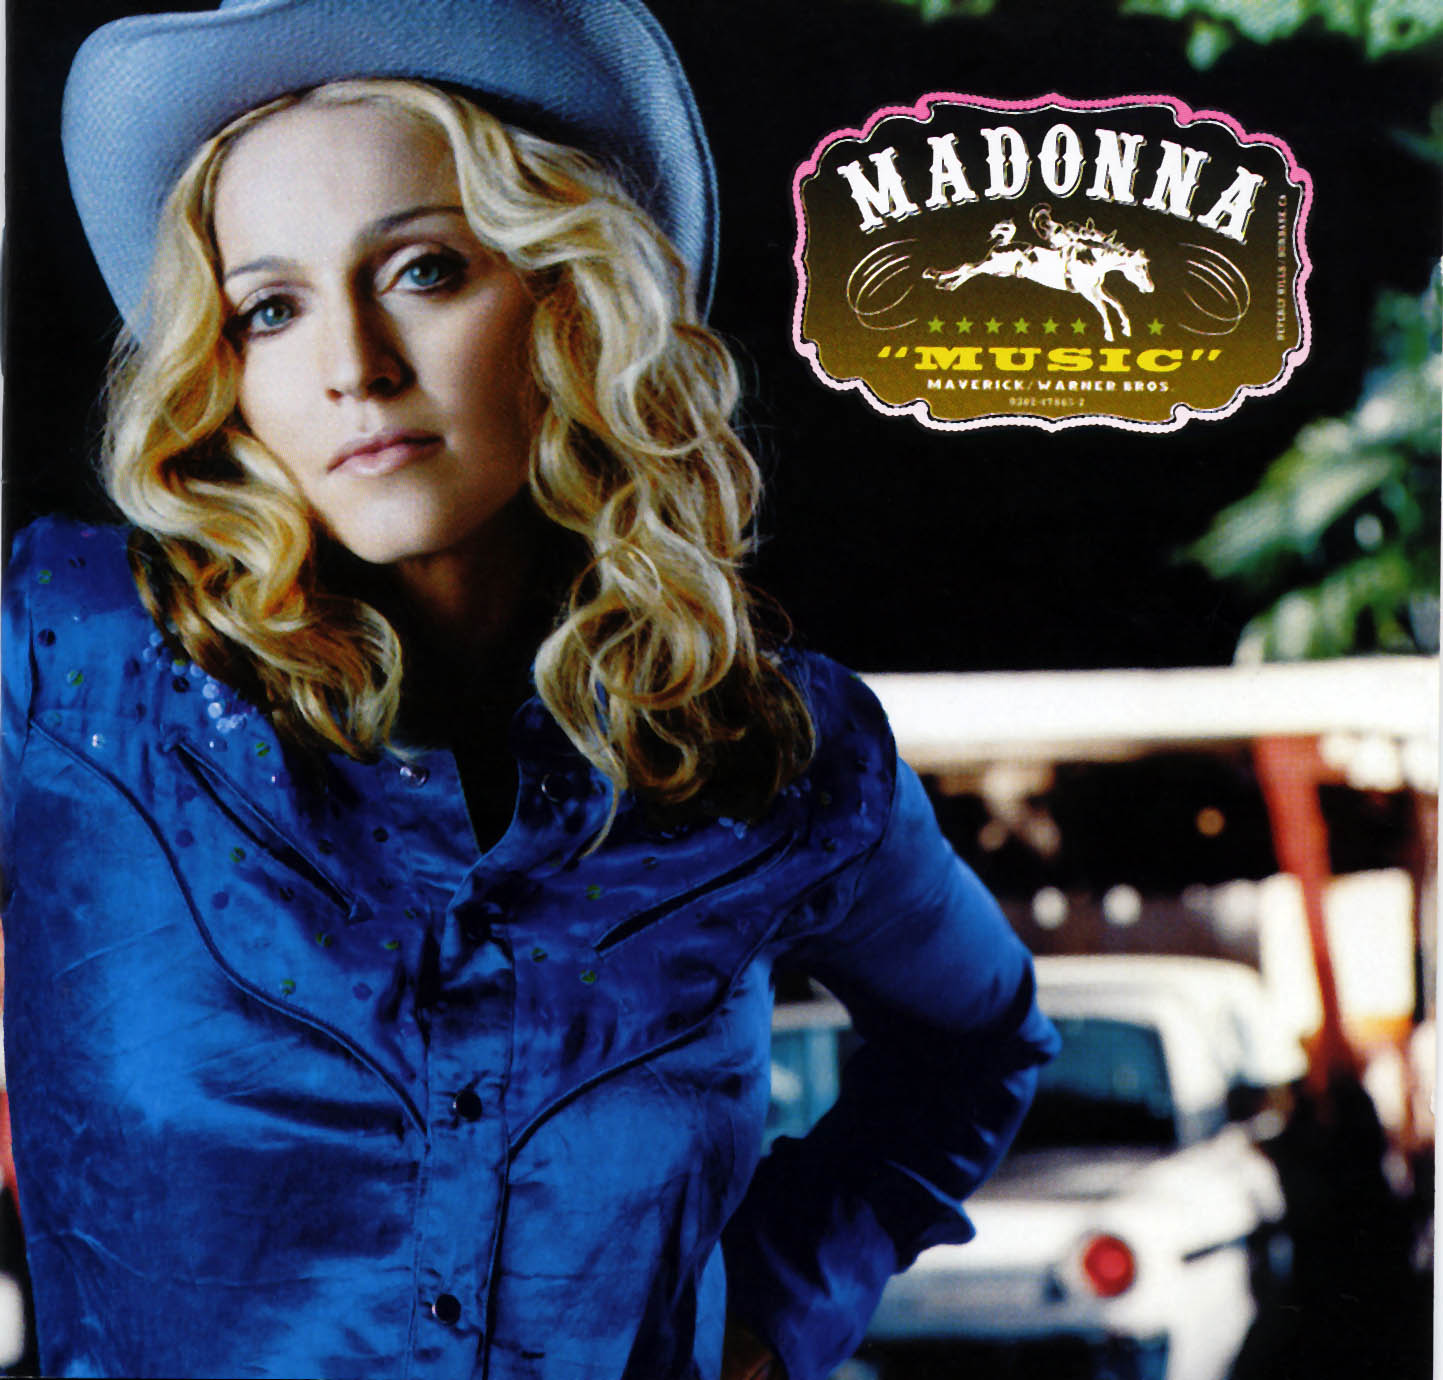 http://4.bp.blogspot.com/_RtMJ-VAHcnQ/THMZo45jZFI/AAAAAAAAA9A/ec1VY7IQcoA/s1600/Madonna-Music-Frontal.jpg